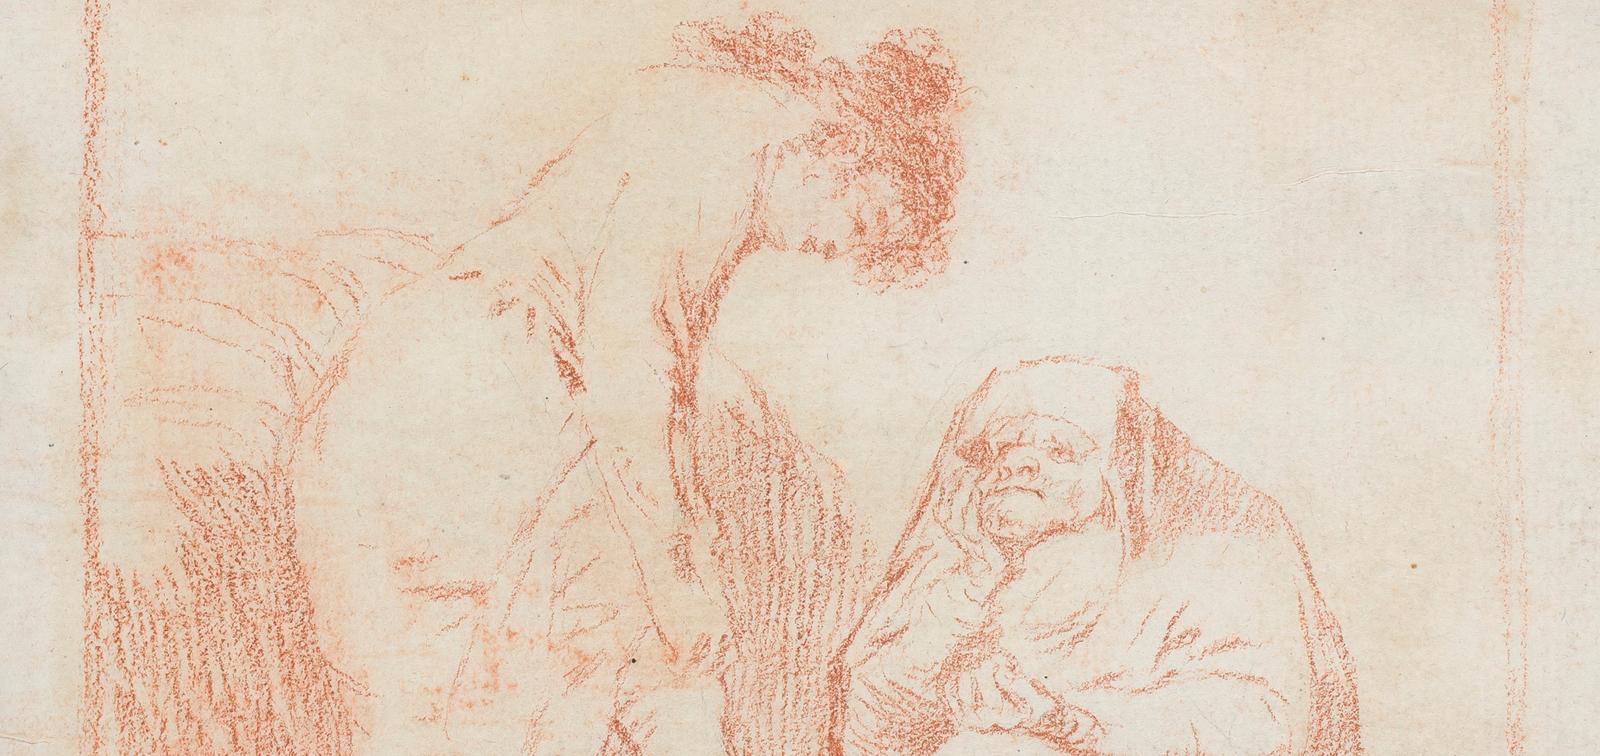 Temporary Installation: Goya's Drawings restored